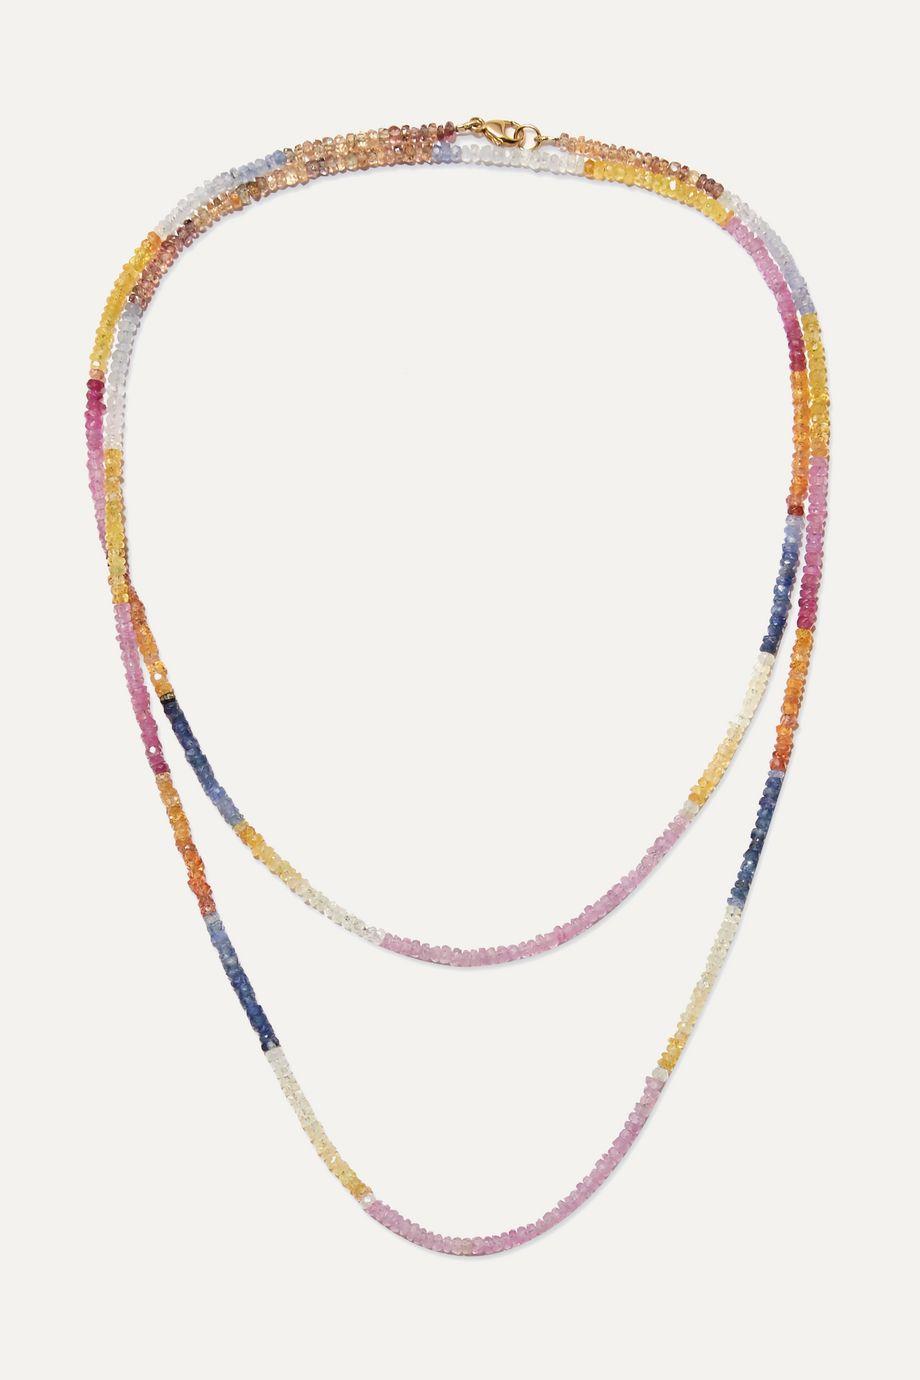 Harris Zhu 14-karat gold and multi-stone necklace